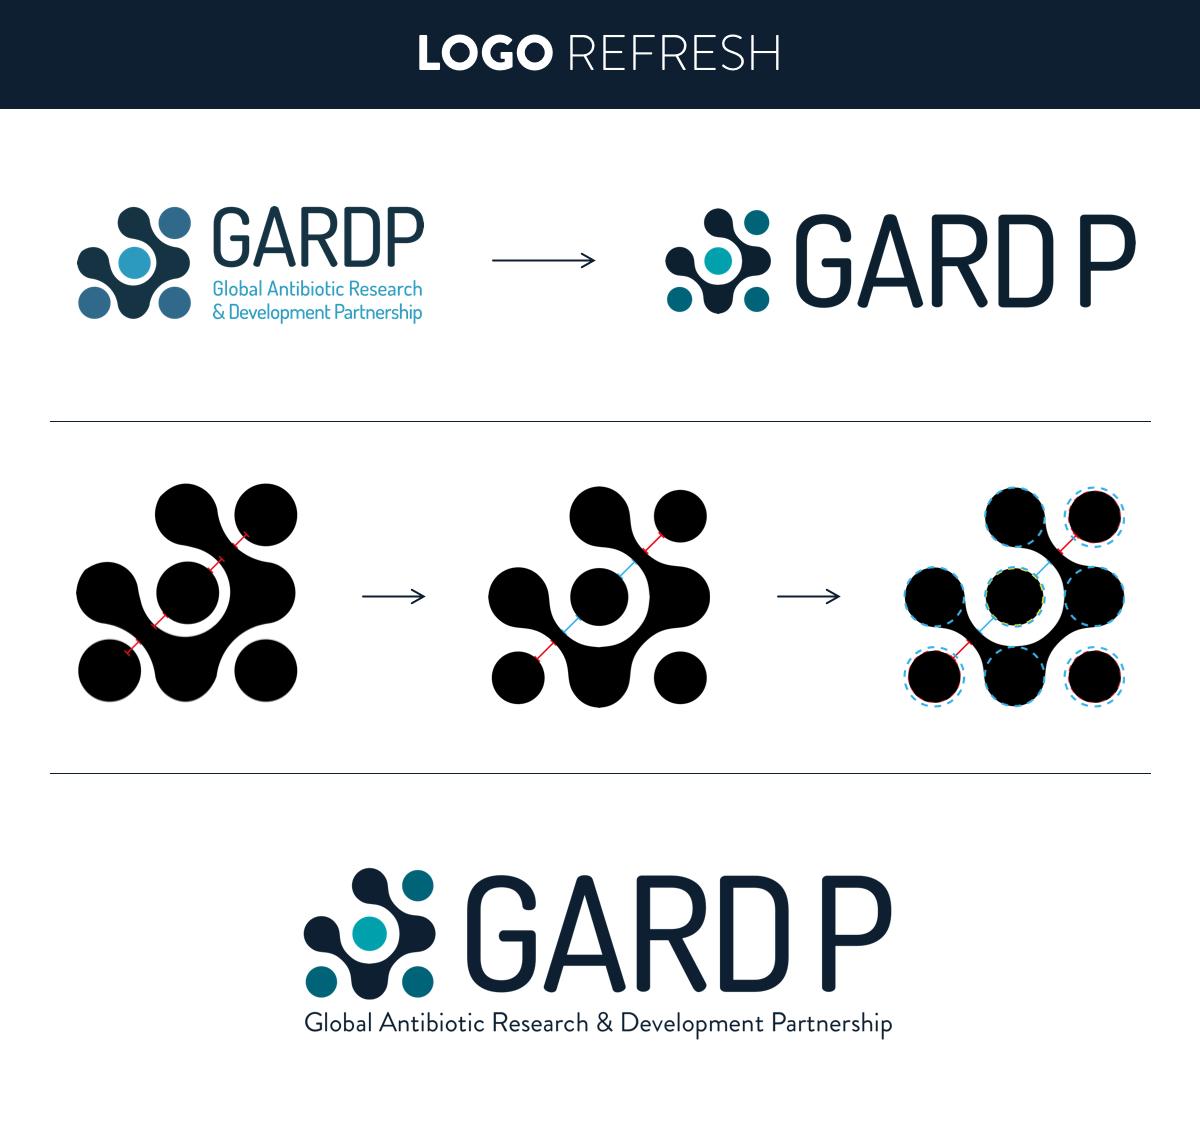 gardp-branding-enigma